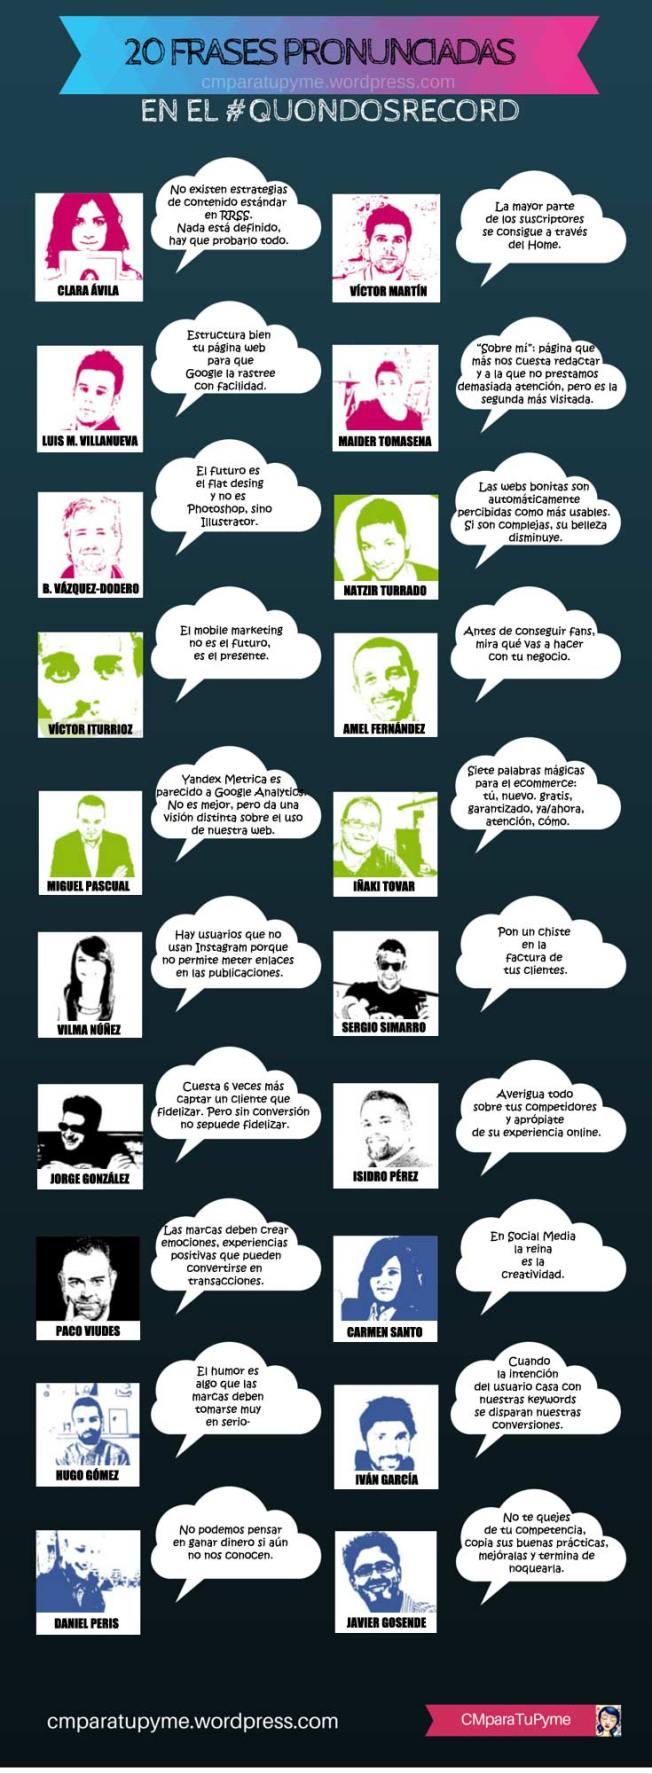 Infografía 20 frases del #quondosrecord